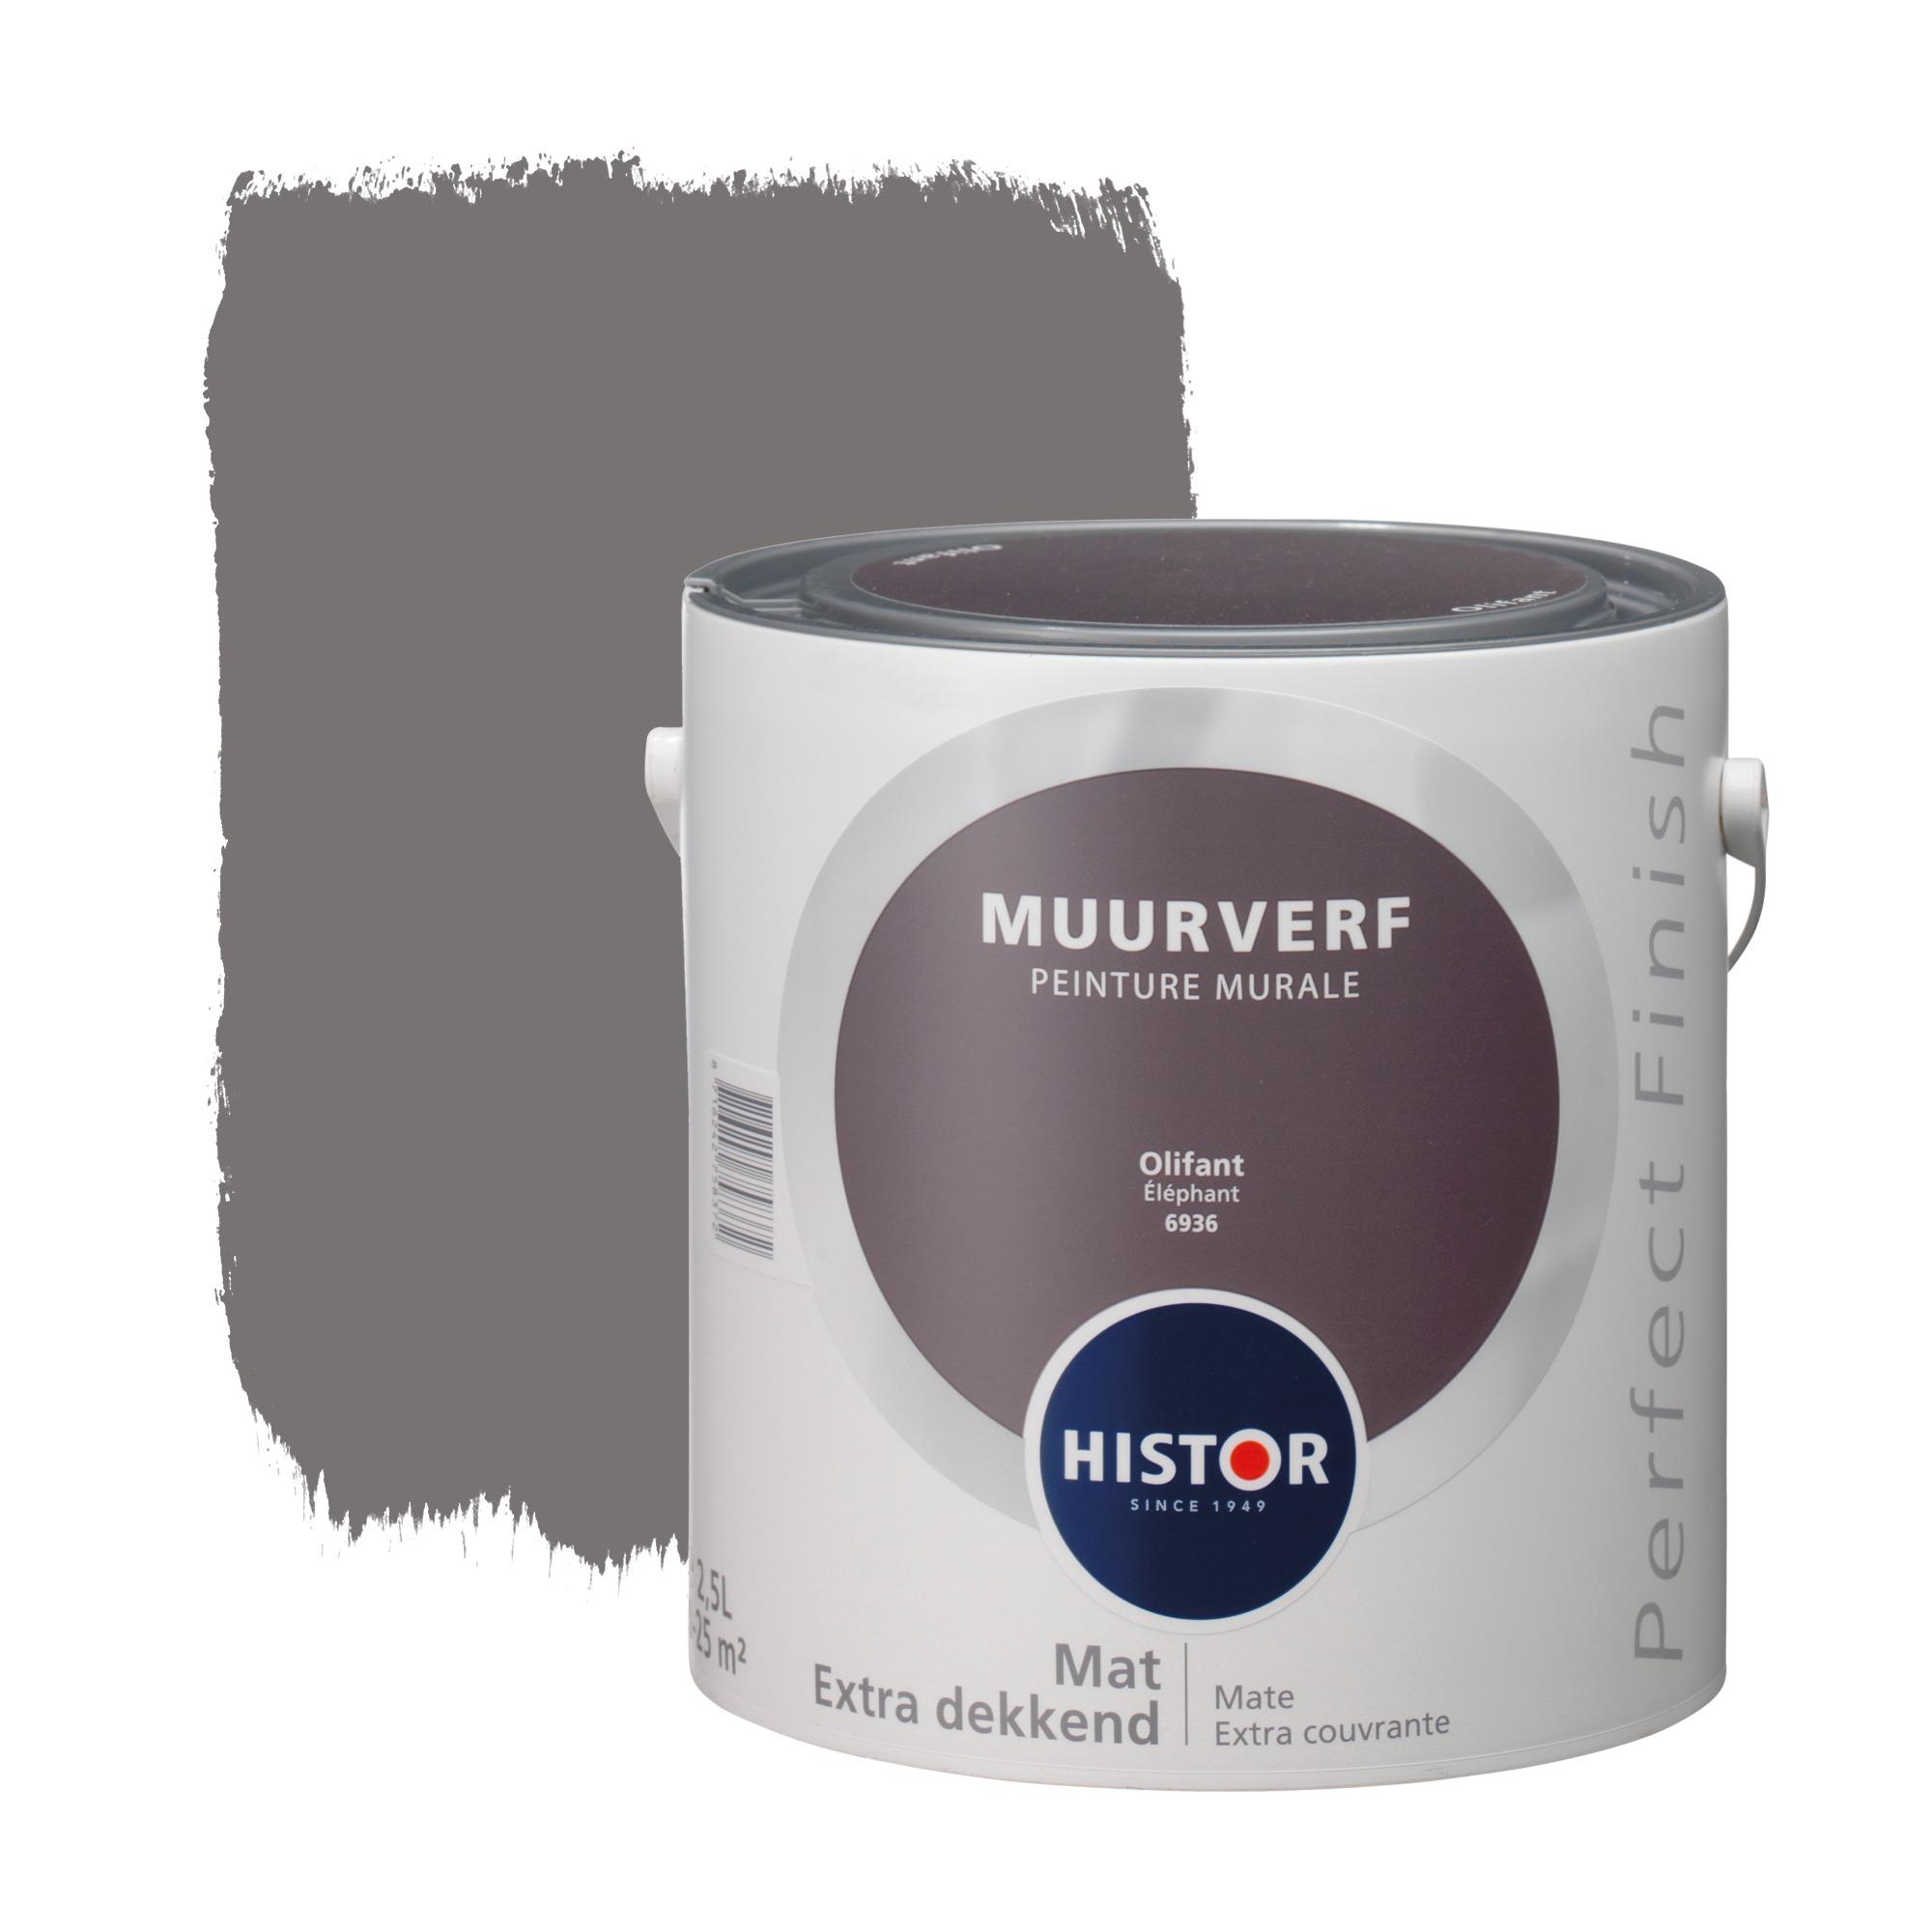 Histor perfect finish muurverf mat paars 6936 2,5 l